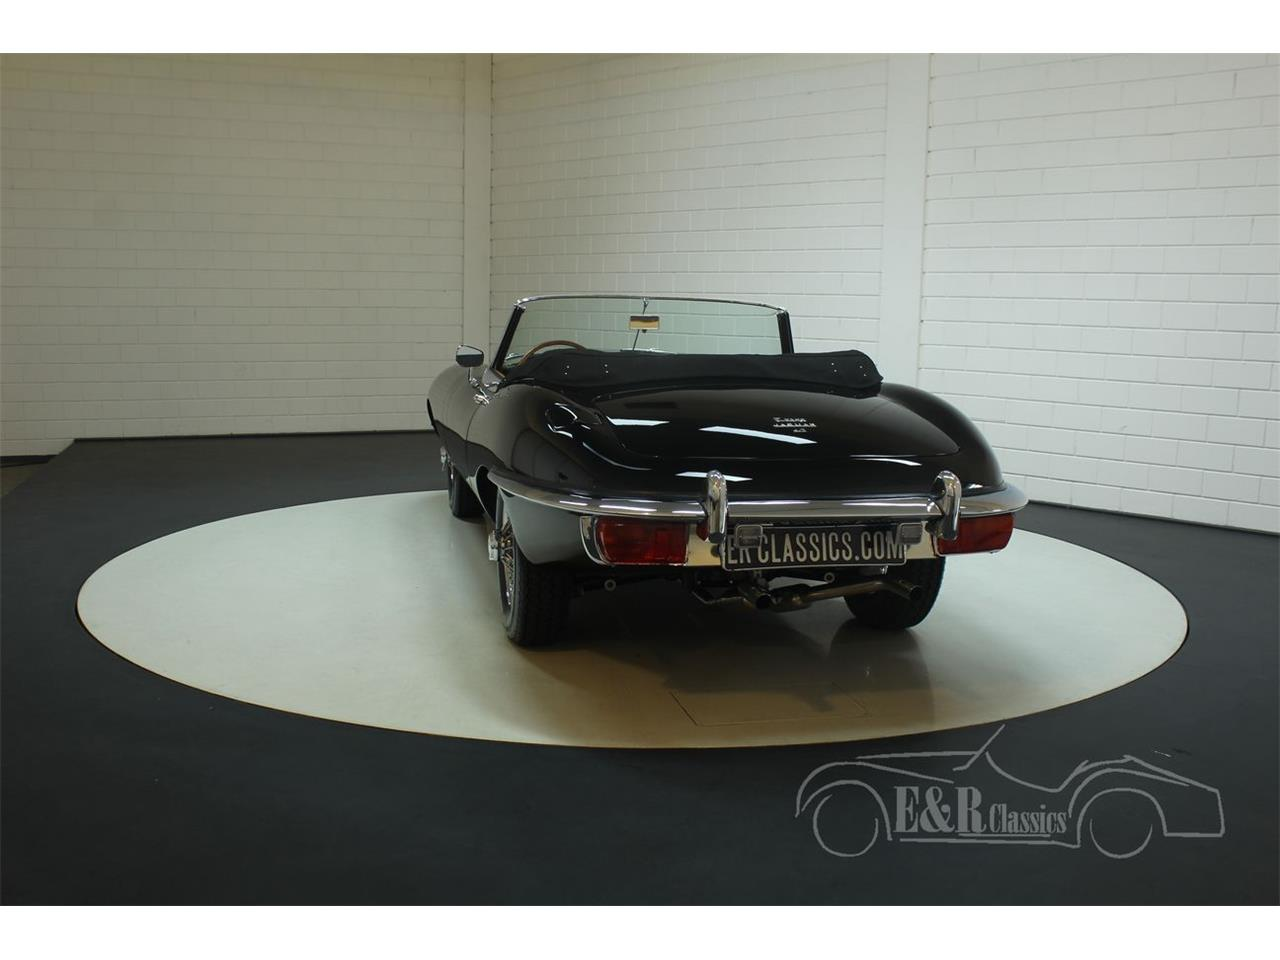 Large Picture of 1969 Jaguar E-Type located in Waalwijk noord brabant - $145,500.00 - QOU8